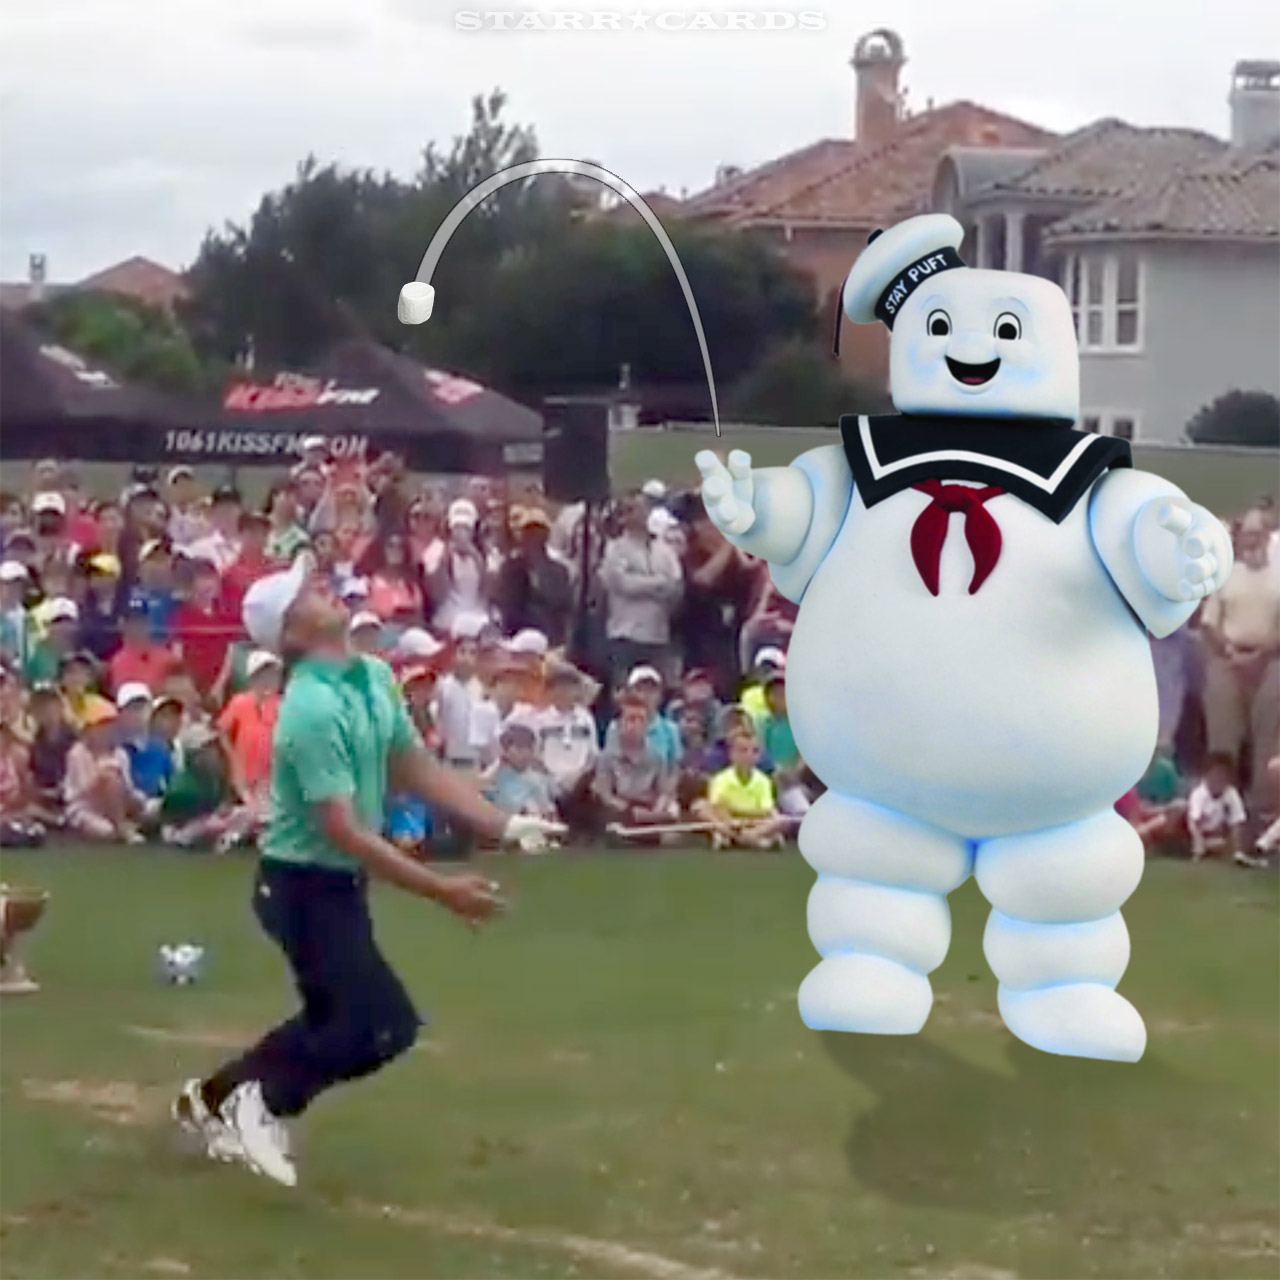 Stay Puft Marshmallow Man assists Jordan Spieth on a golf trick shot